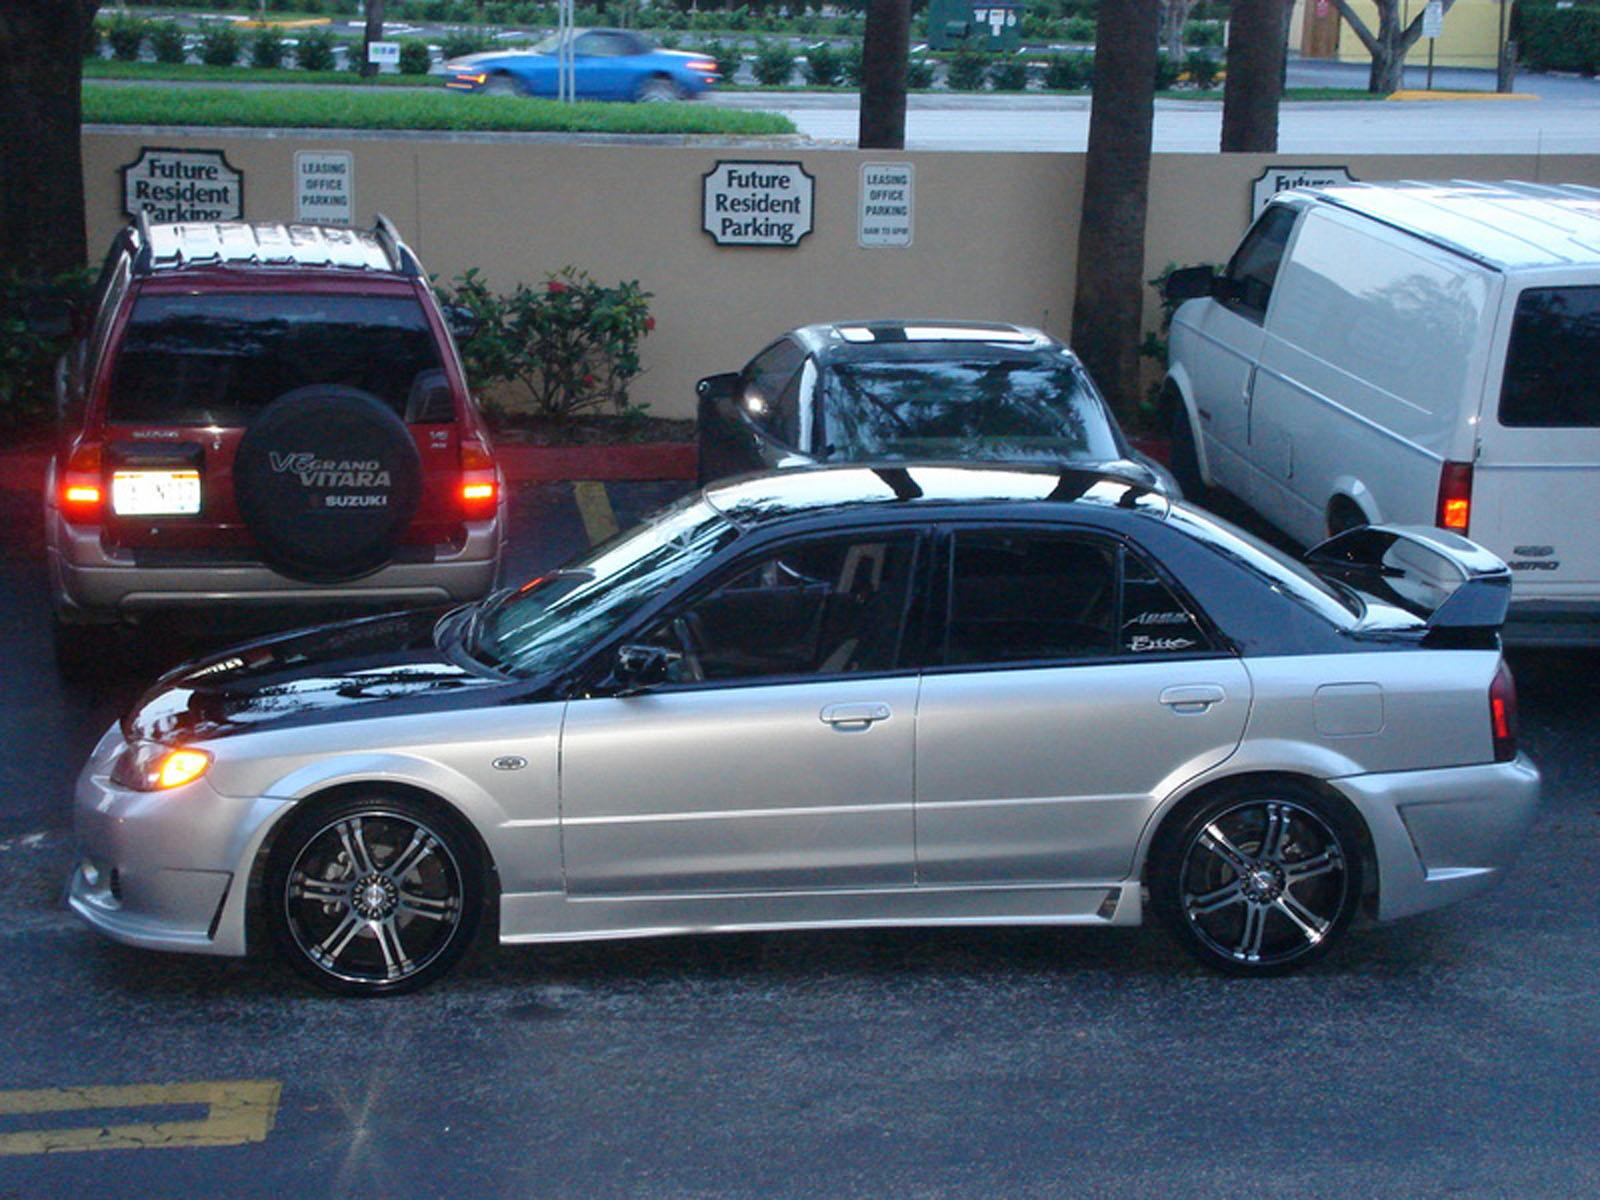 2003 Mazda Protege Mazdaspeed For Sale Ft Lauderdale Florida